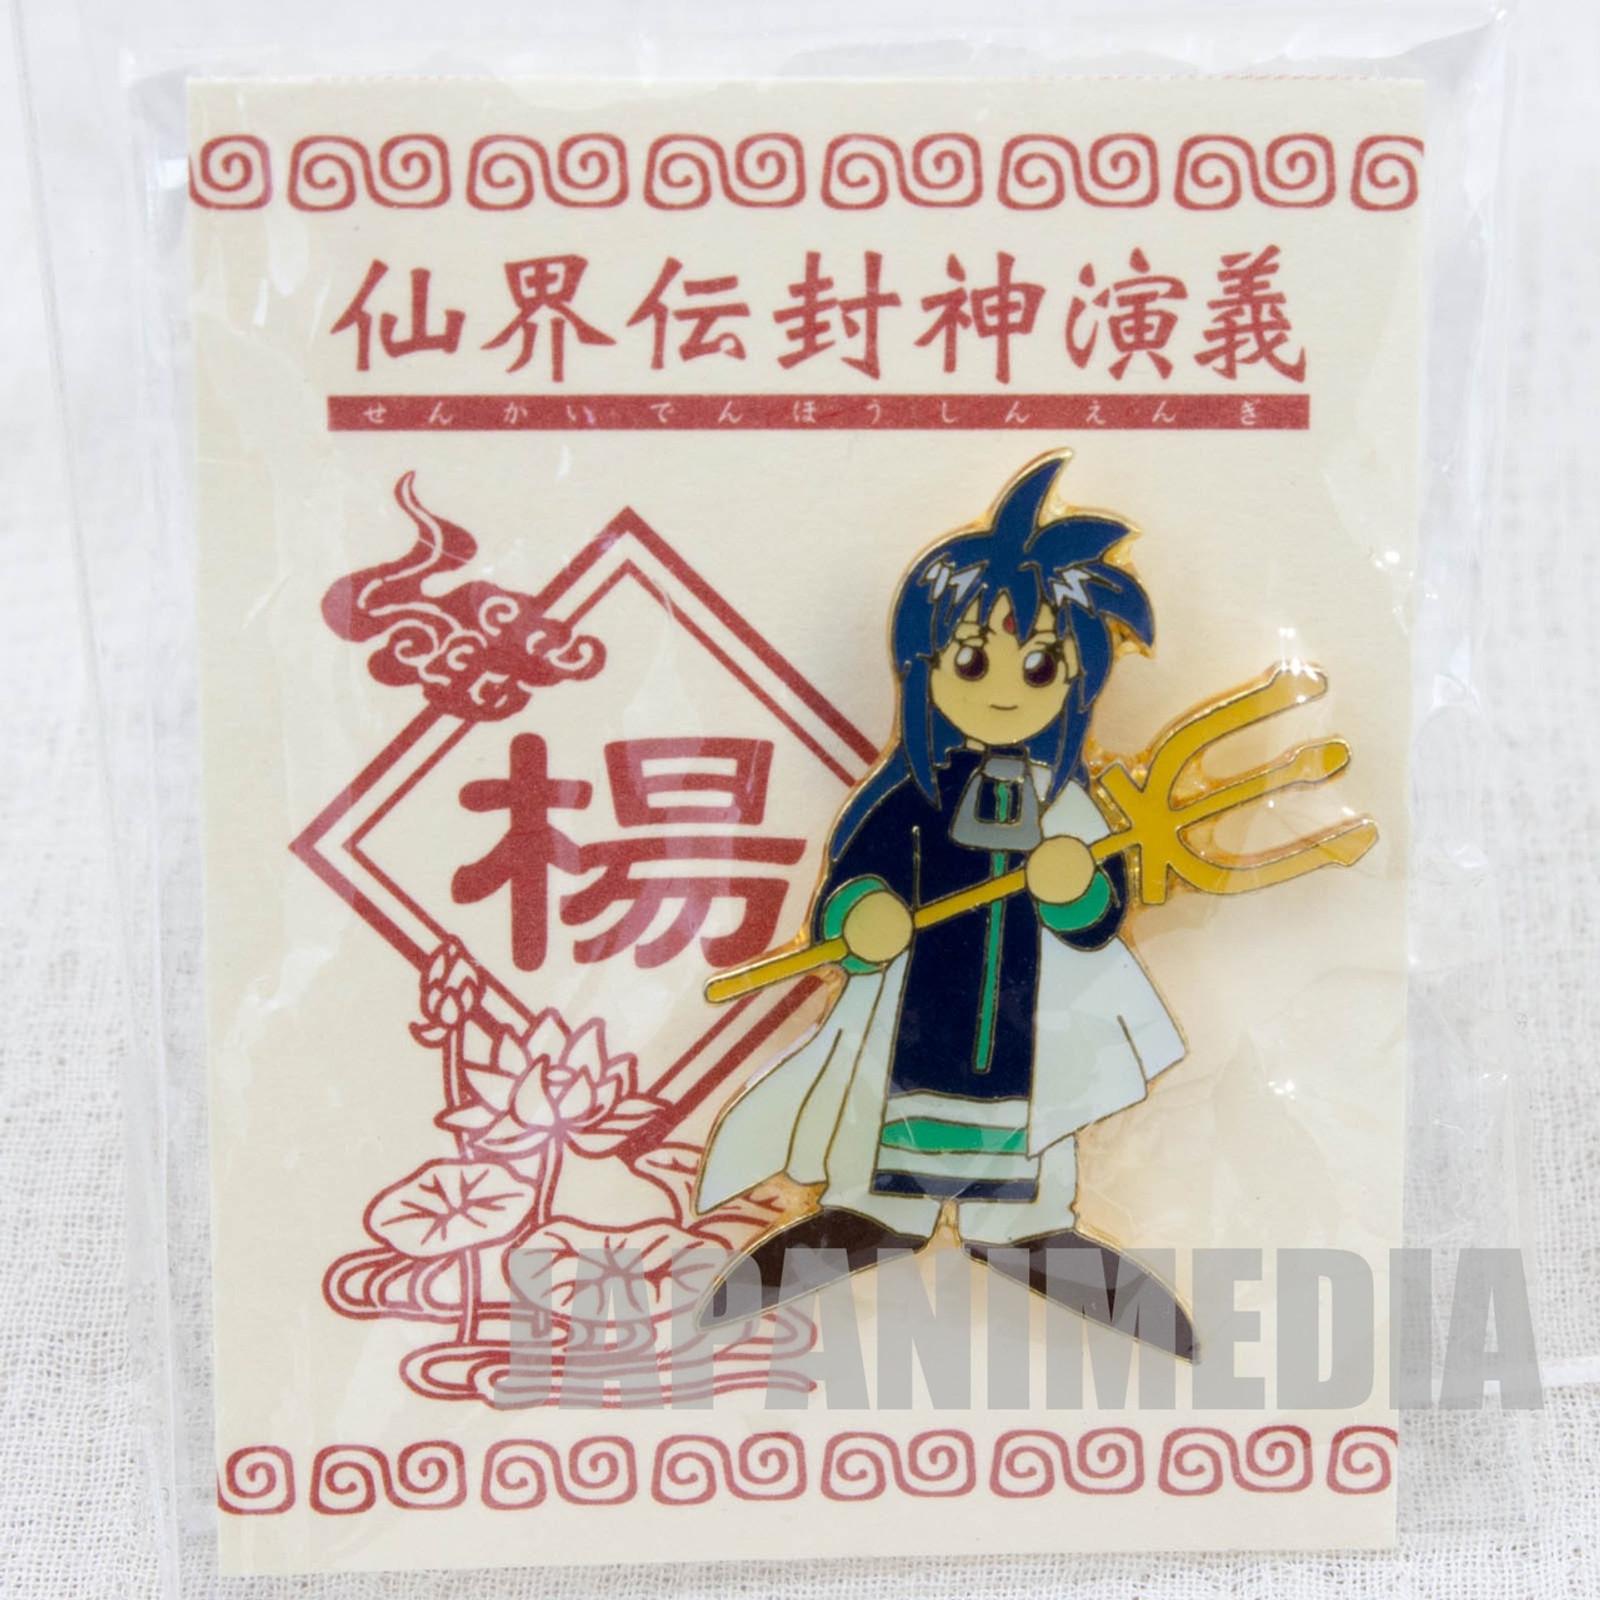 Senkaiden Hoshin Engi Youzen Mini Metal Pins JAPAN ANIME MANGA